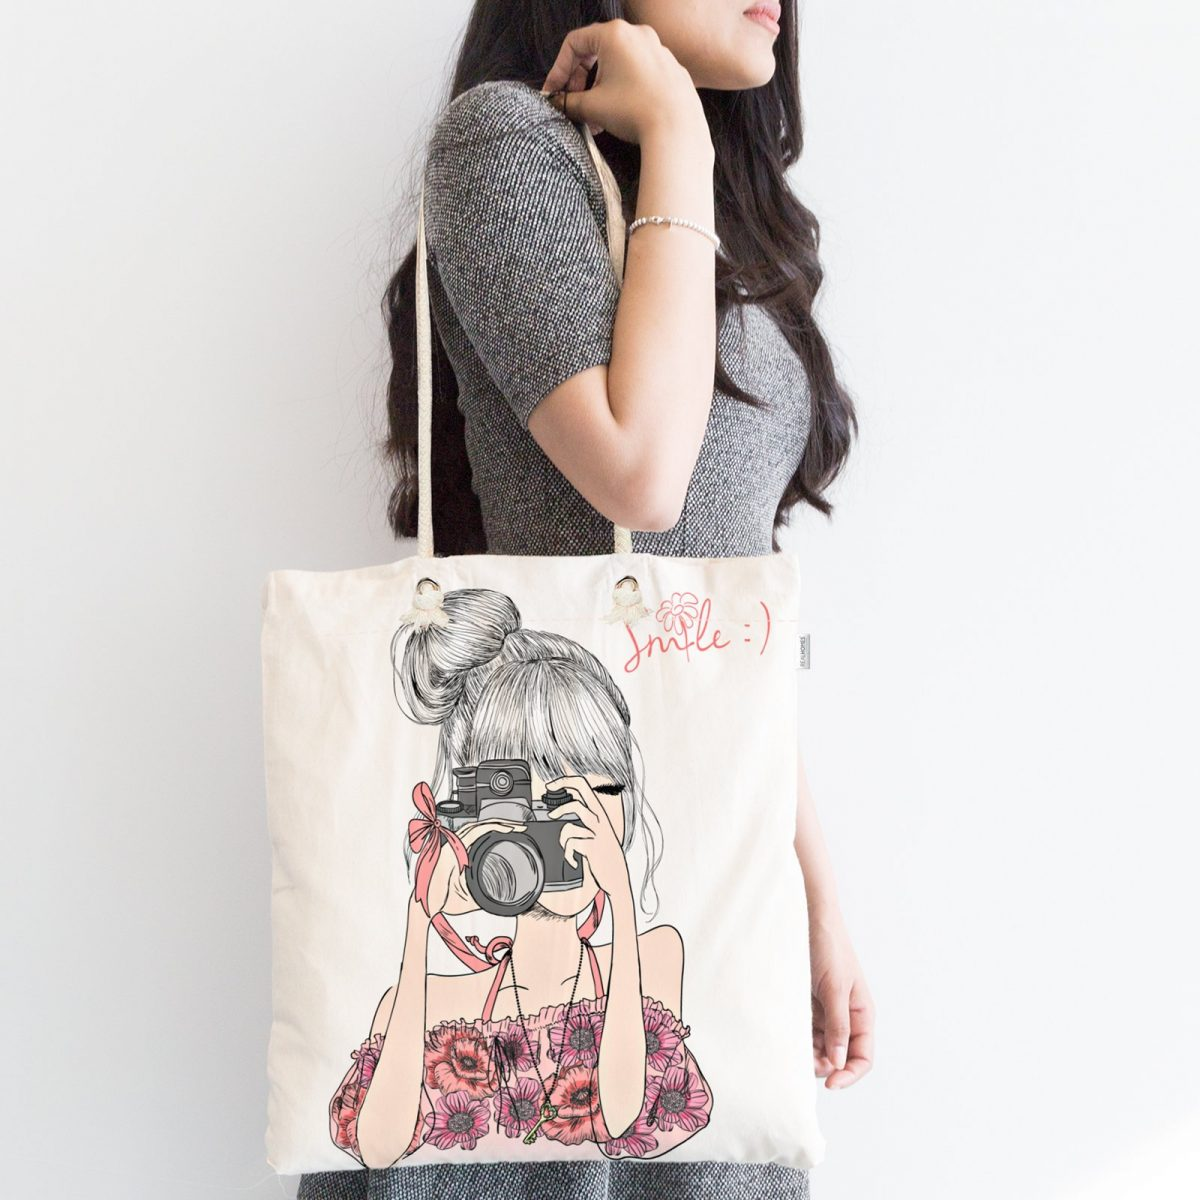 Fashion Girl Dijital Baskılı Modern Fermuarlı Kumaş Çanta Realhomes